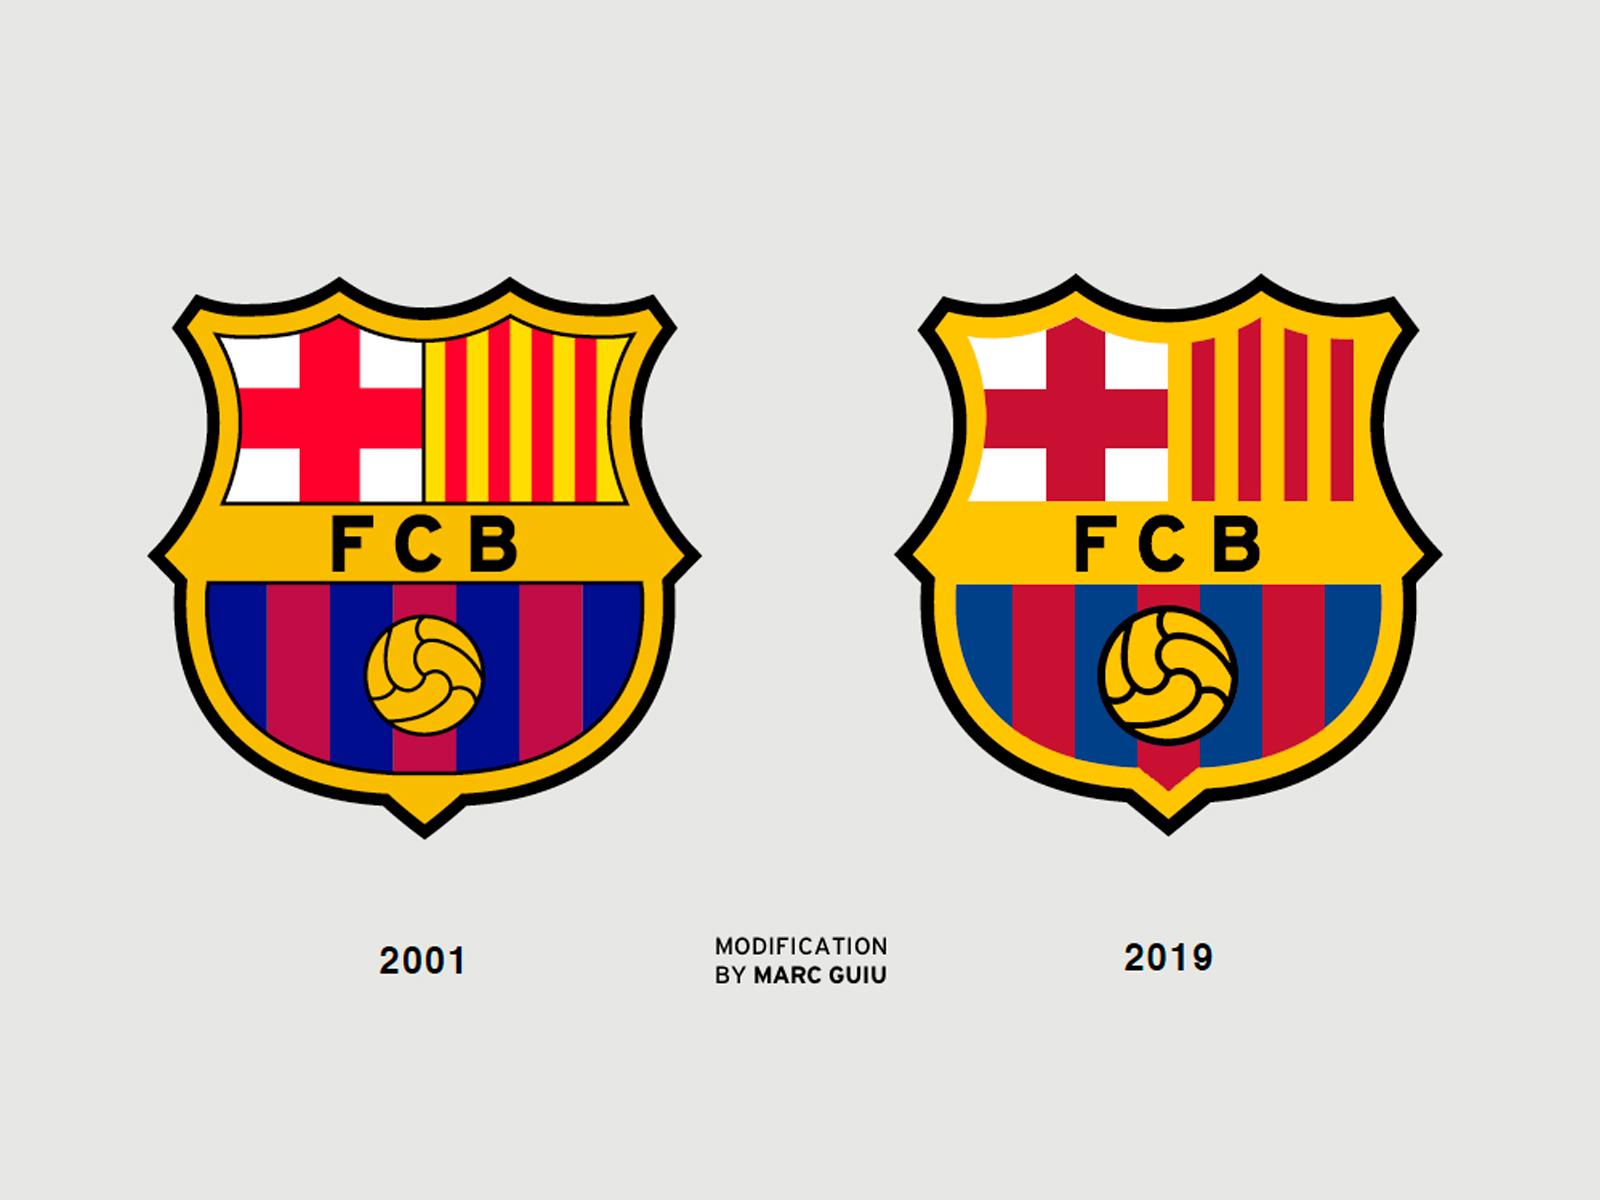 fcb fcbarcelona logo redesign by marc guiu on dribbble fcb fcbarcelona logo redesign by marc